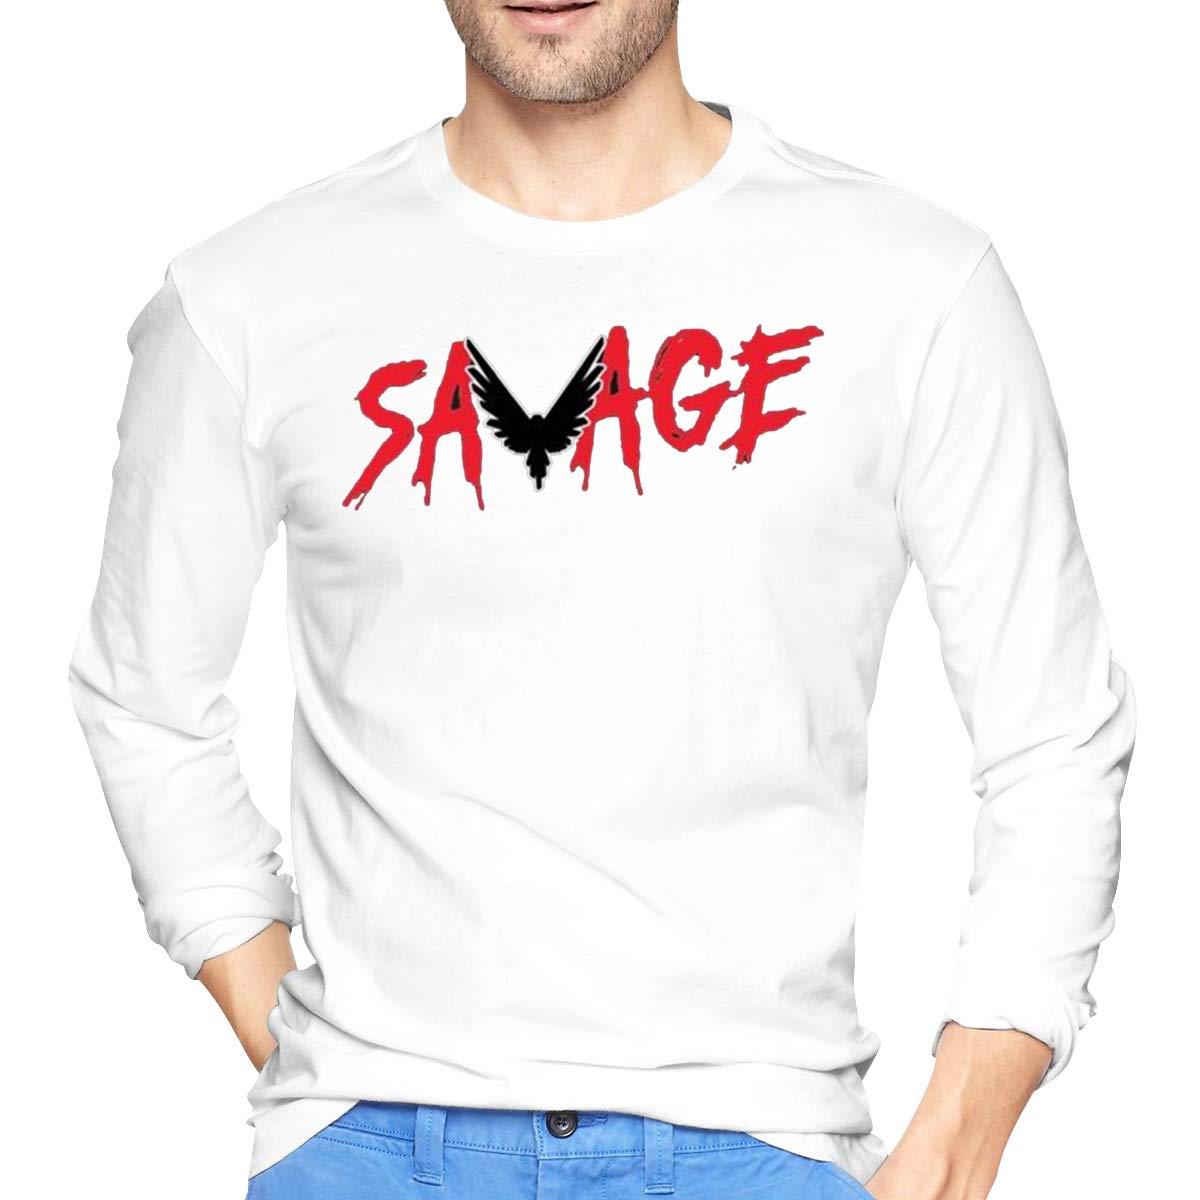 Mens Casual Cotton Savage Parrot Logan Paul Tee Shirts Long Sleeve O-Neck Sports Fitness Tops T-Shirt Men T Shirt